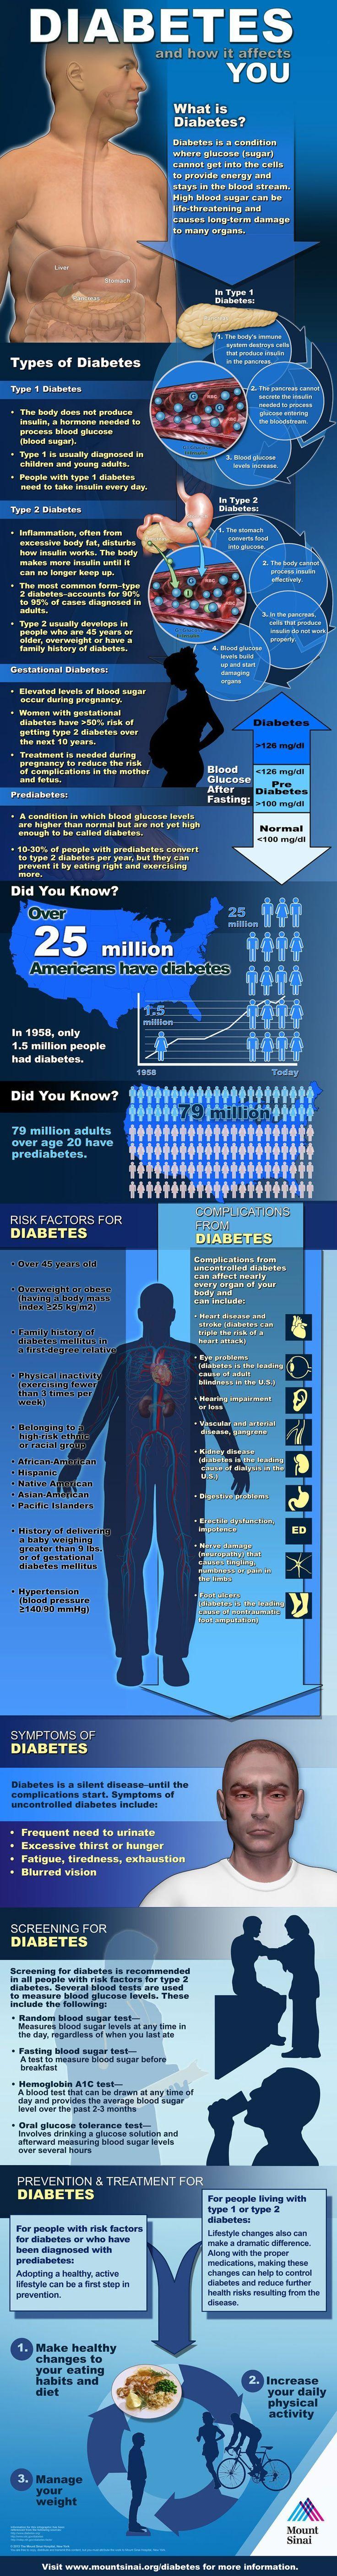 Will new diagnostic criteria for diabetes mellitus change ...